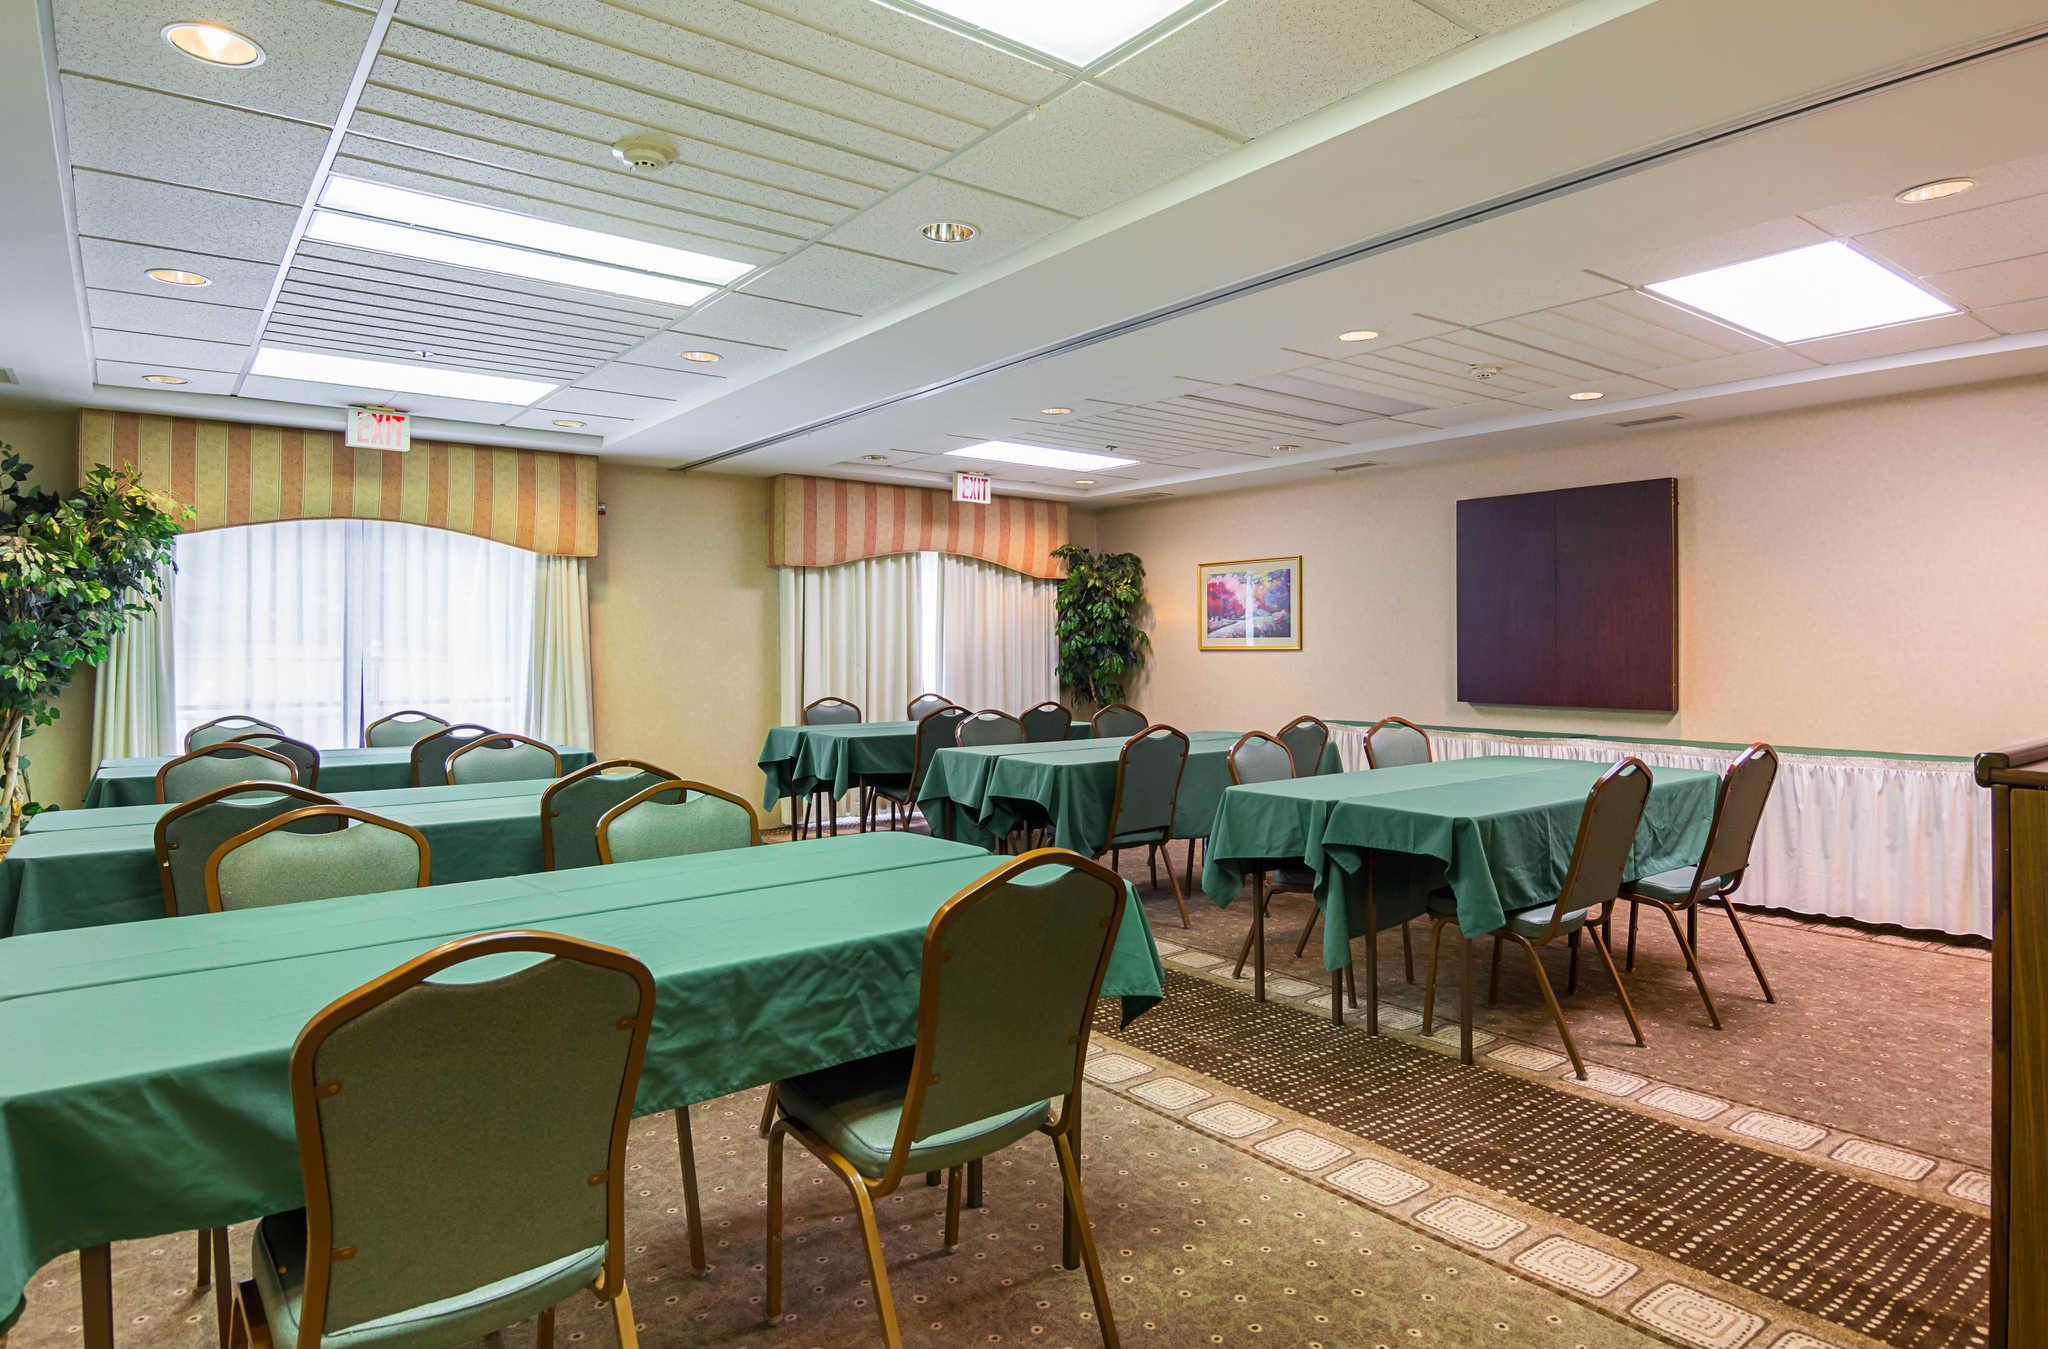 Quality Inn & Suites Kearneysville - Martinsburg image 27